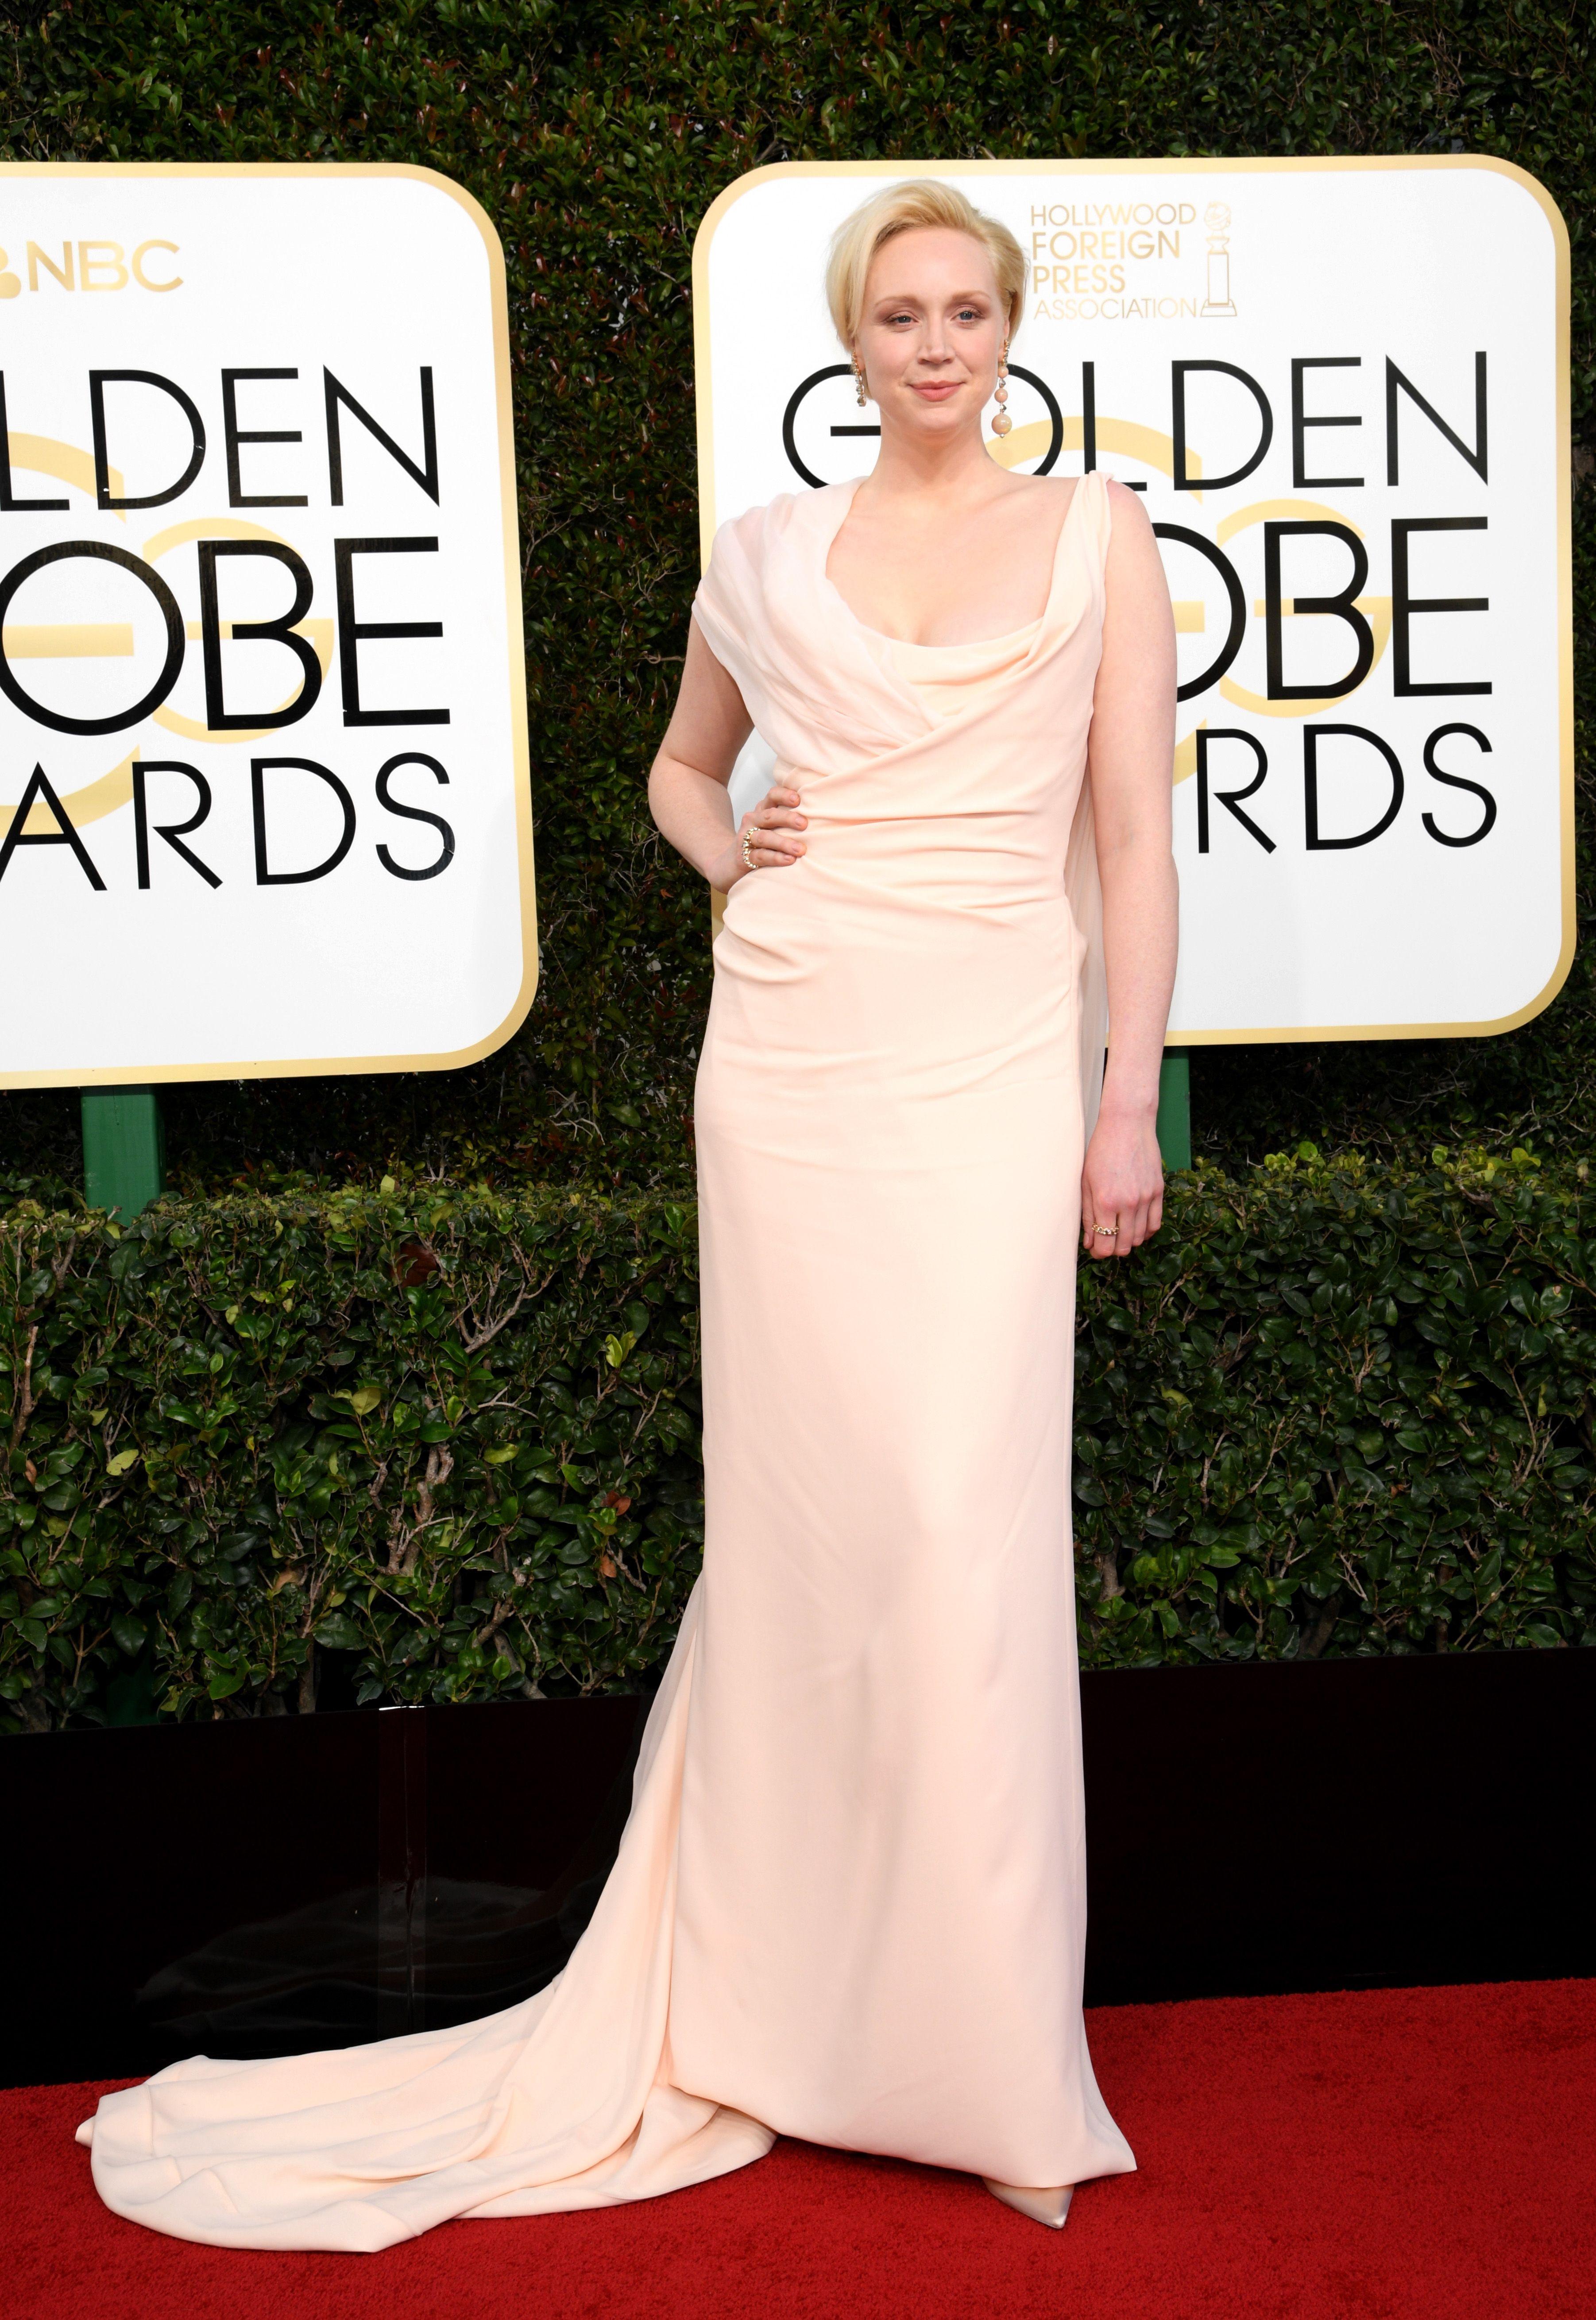 Golden Globes 2017 red carpet fashion